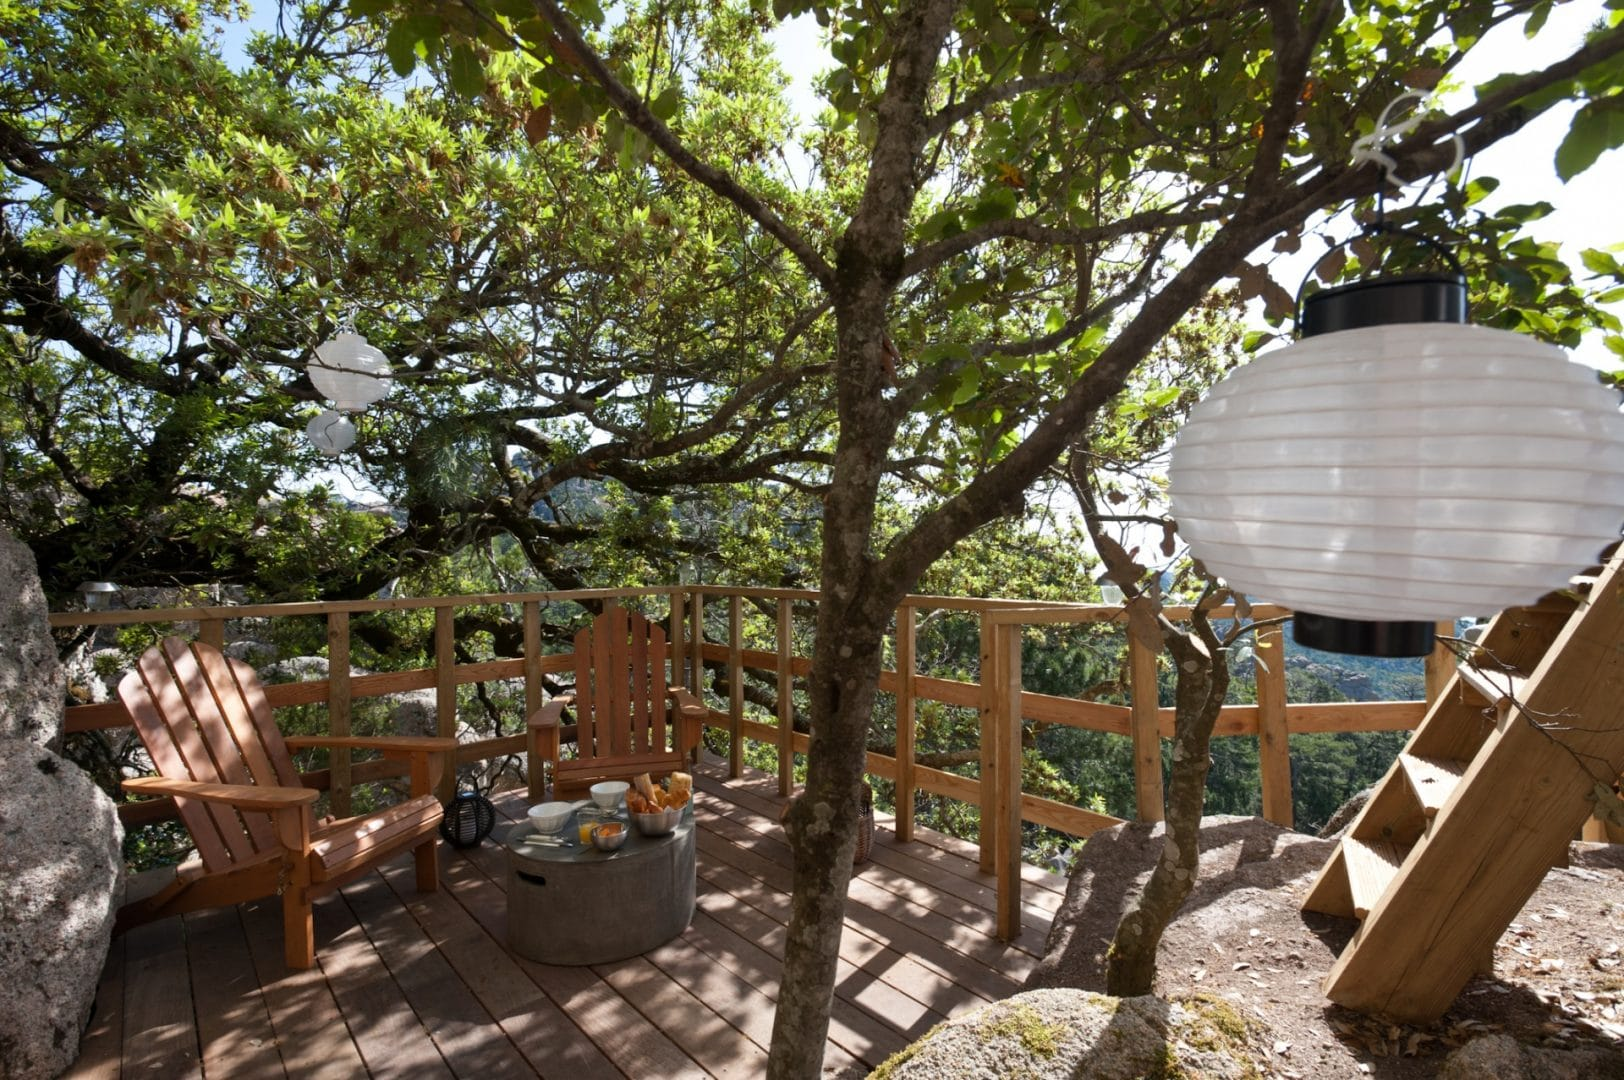 Logement insolite Corse Cocoon suspendu - Les Cro'coeurs Blog voyage